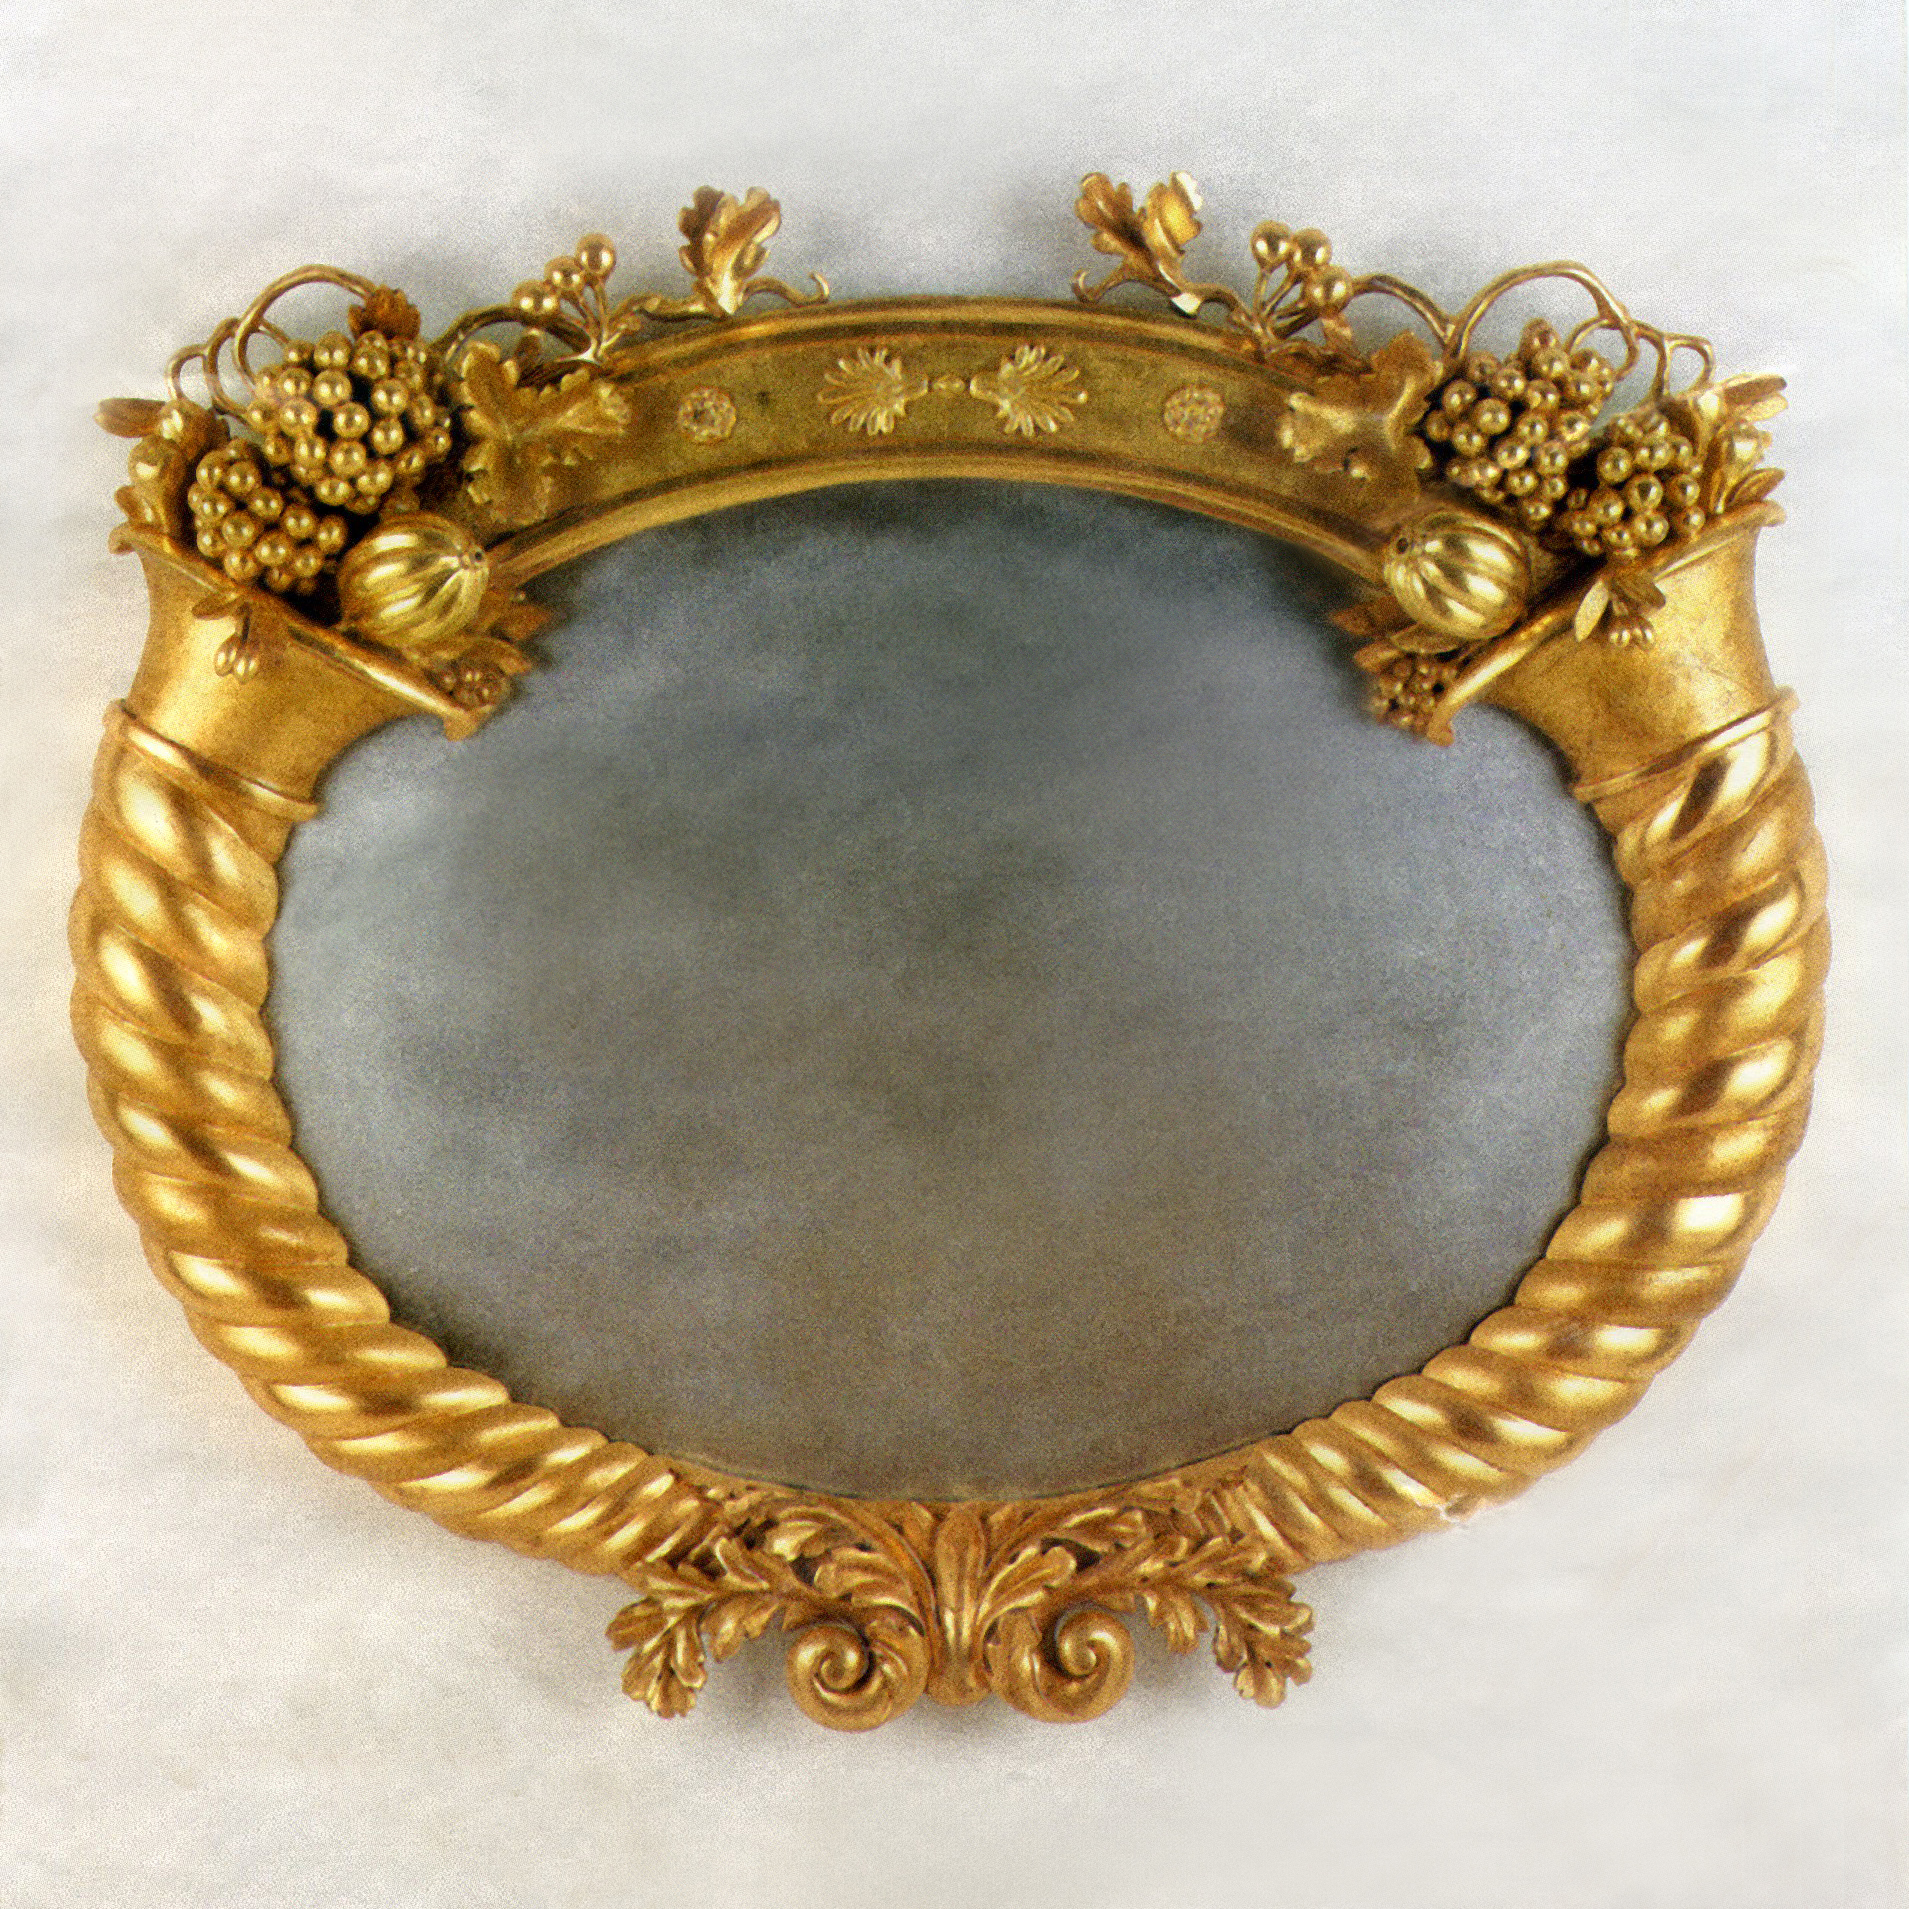 Cornucopia mirror reassembled after restoration.